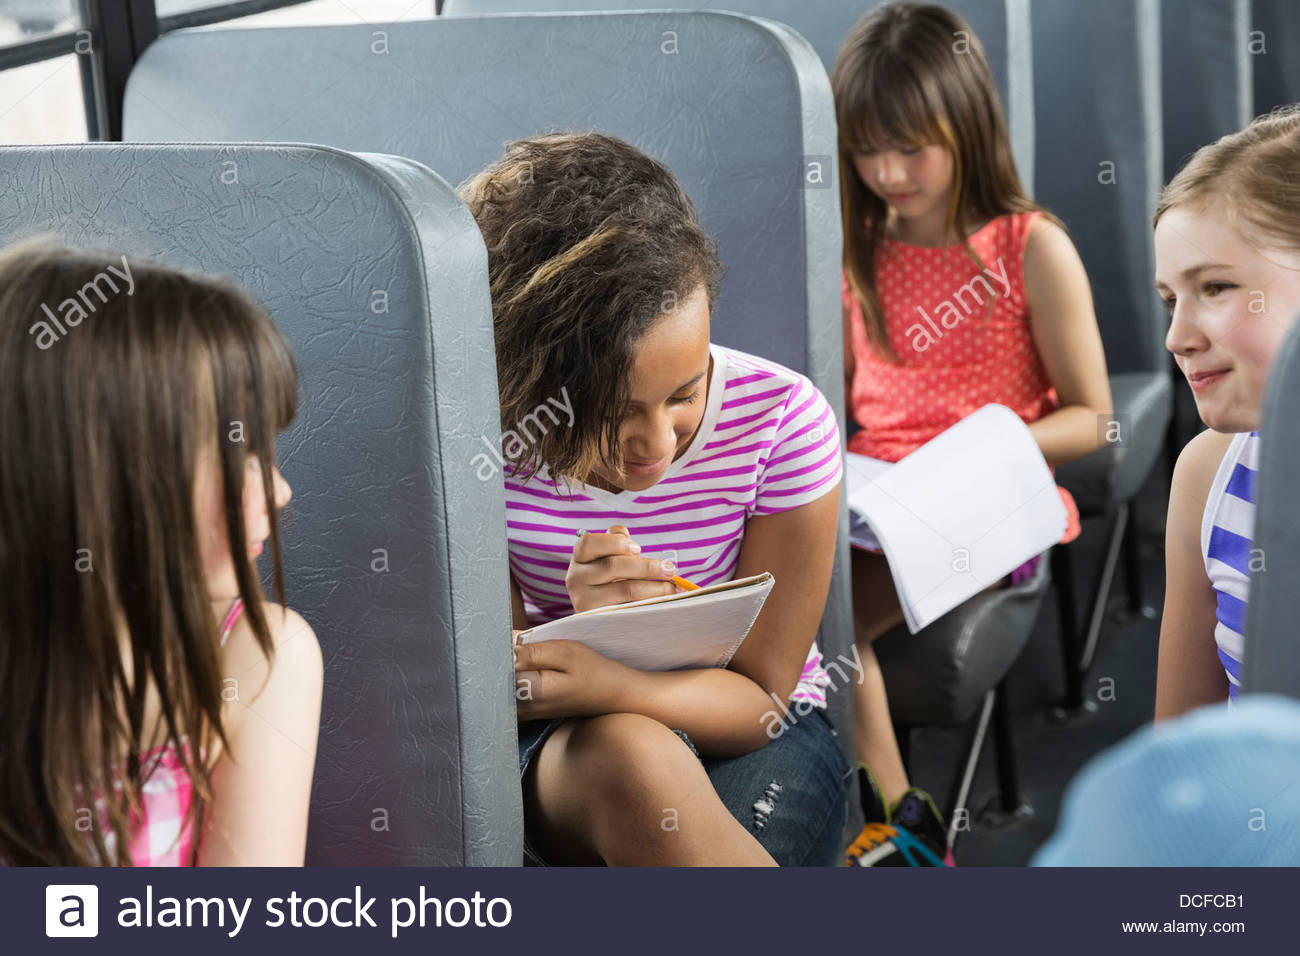 Schoolgirls sitting inside bus - Stock Image